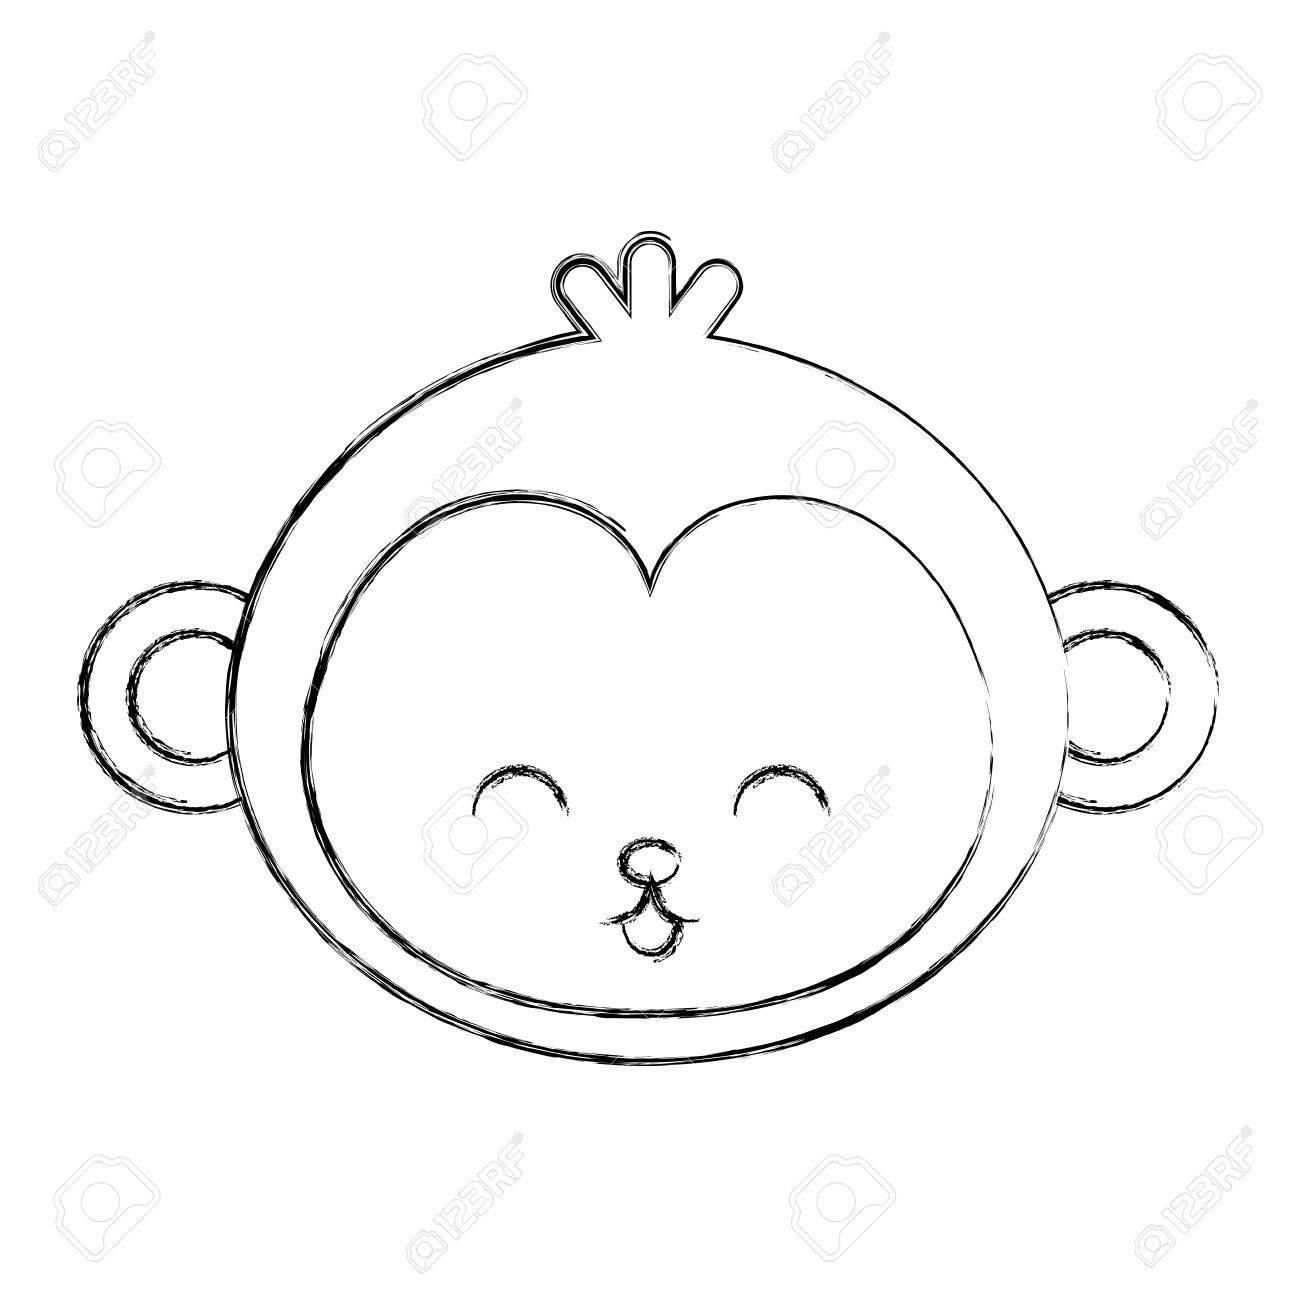 Cute Sketch Draw Monkey Face Cartoon Graphic Deisgn Royalty Free